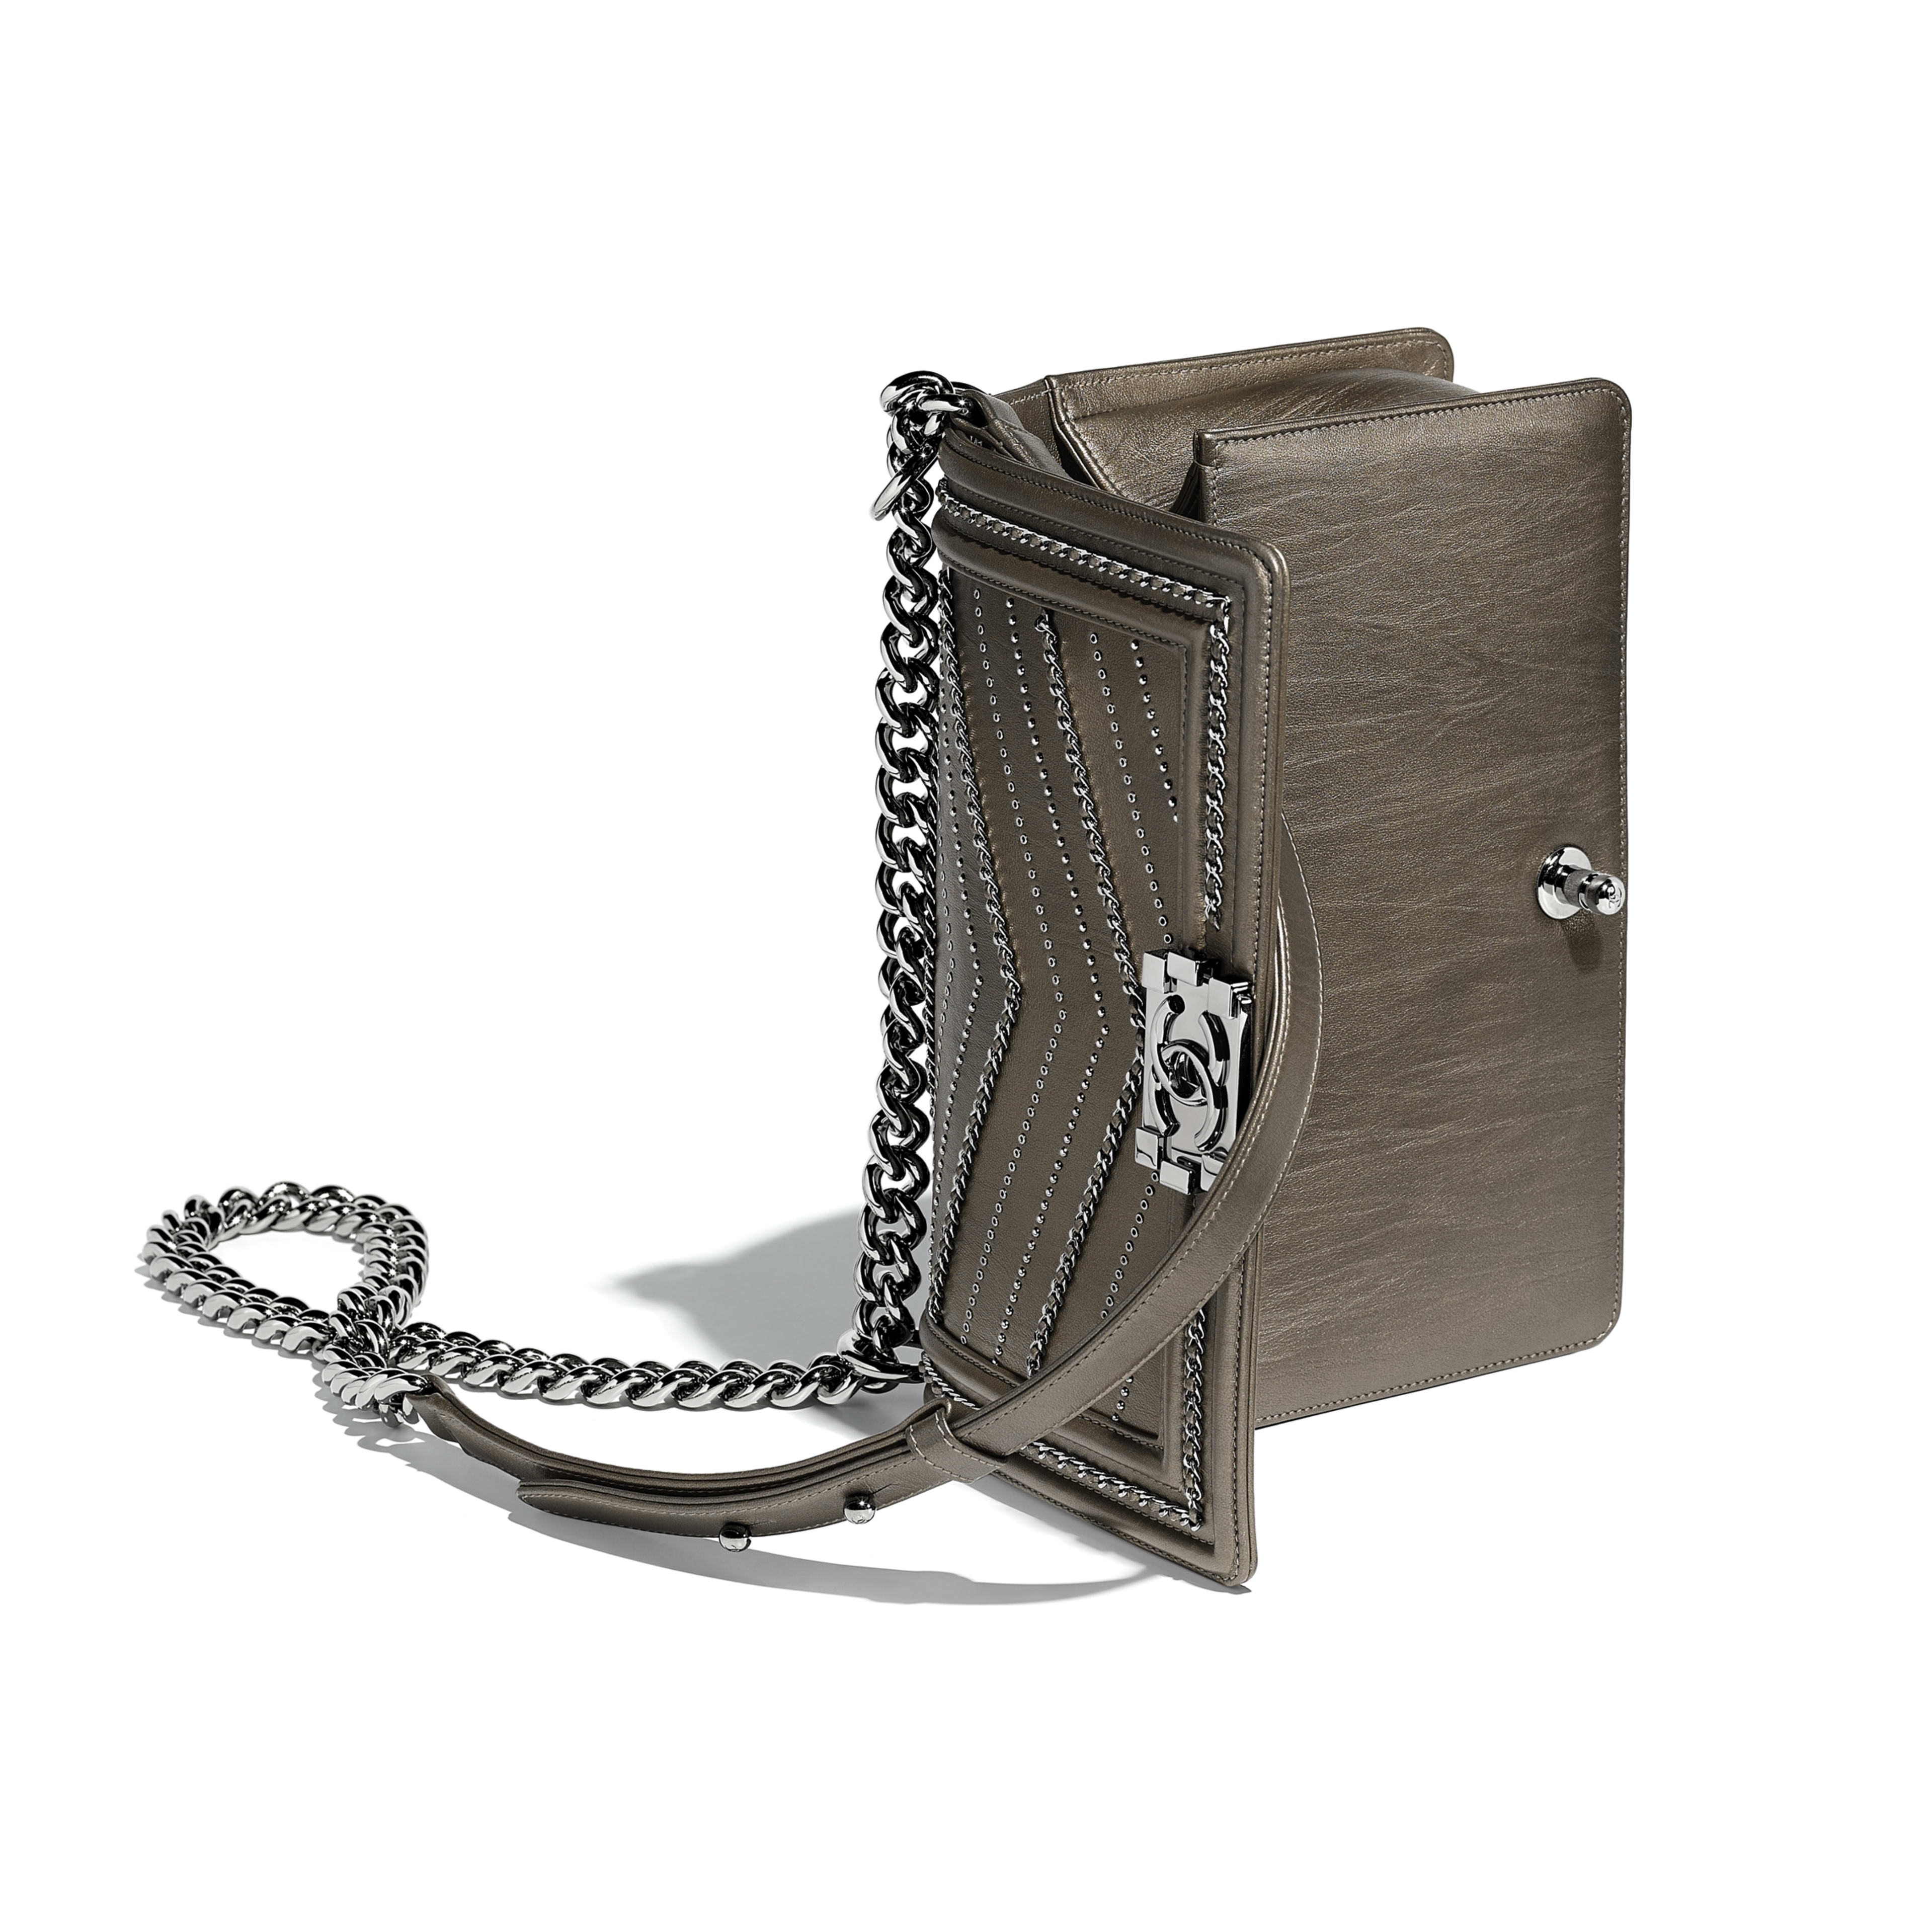 BOY CHANEL Handbag Metallic Crumpled Calfskin & Ruthenium-Finish Metal Silver -                                            view 3 - see full sized version